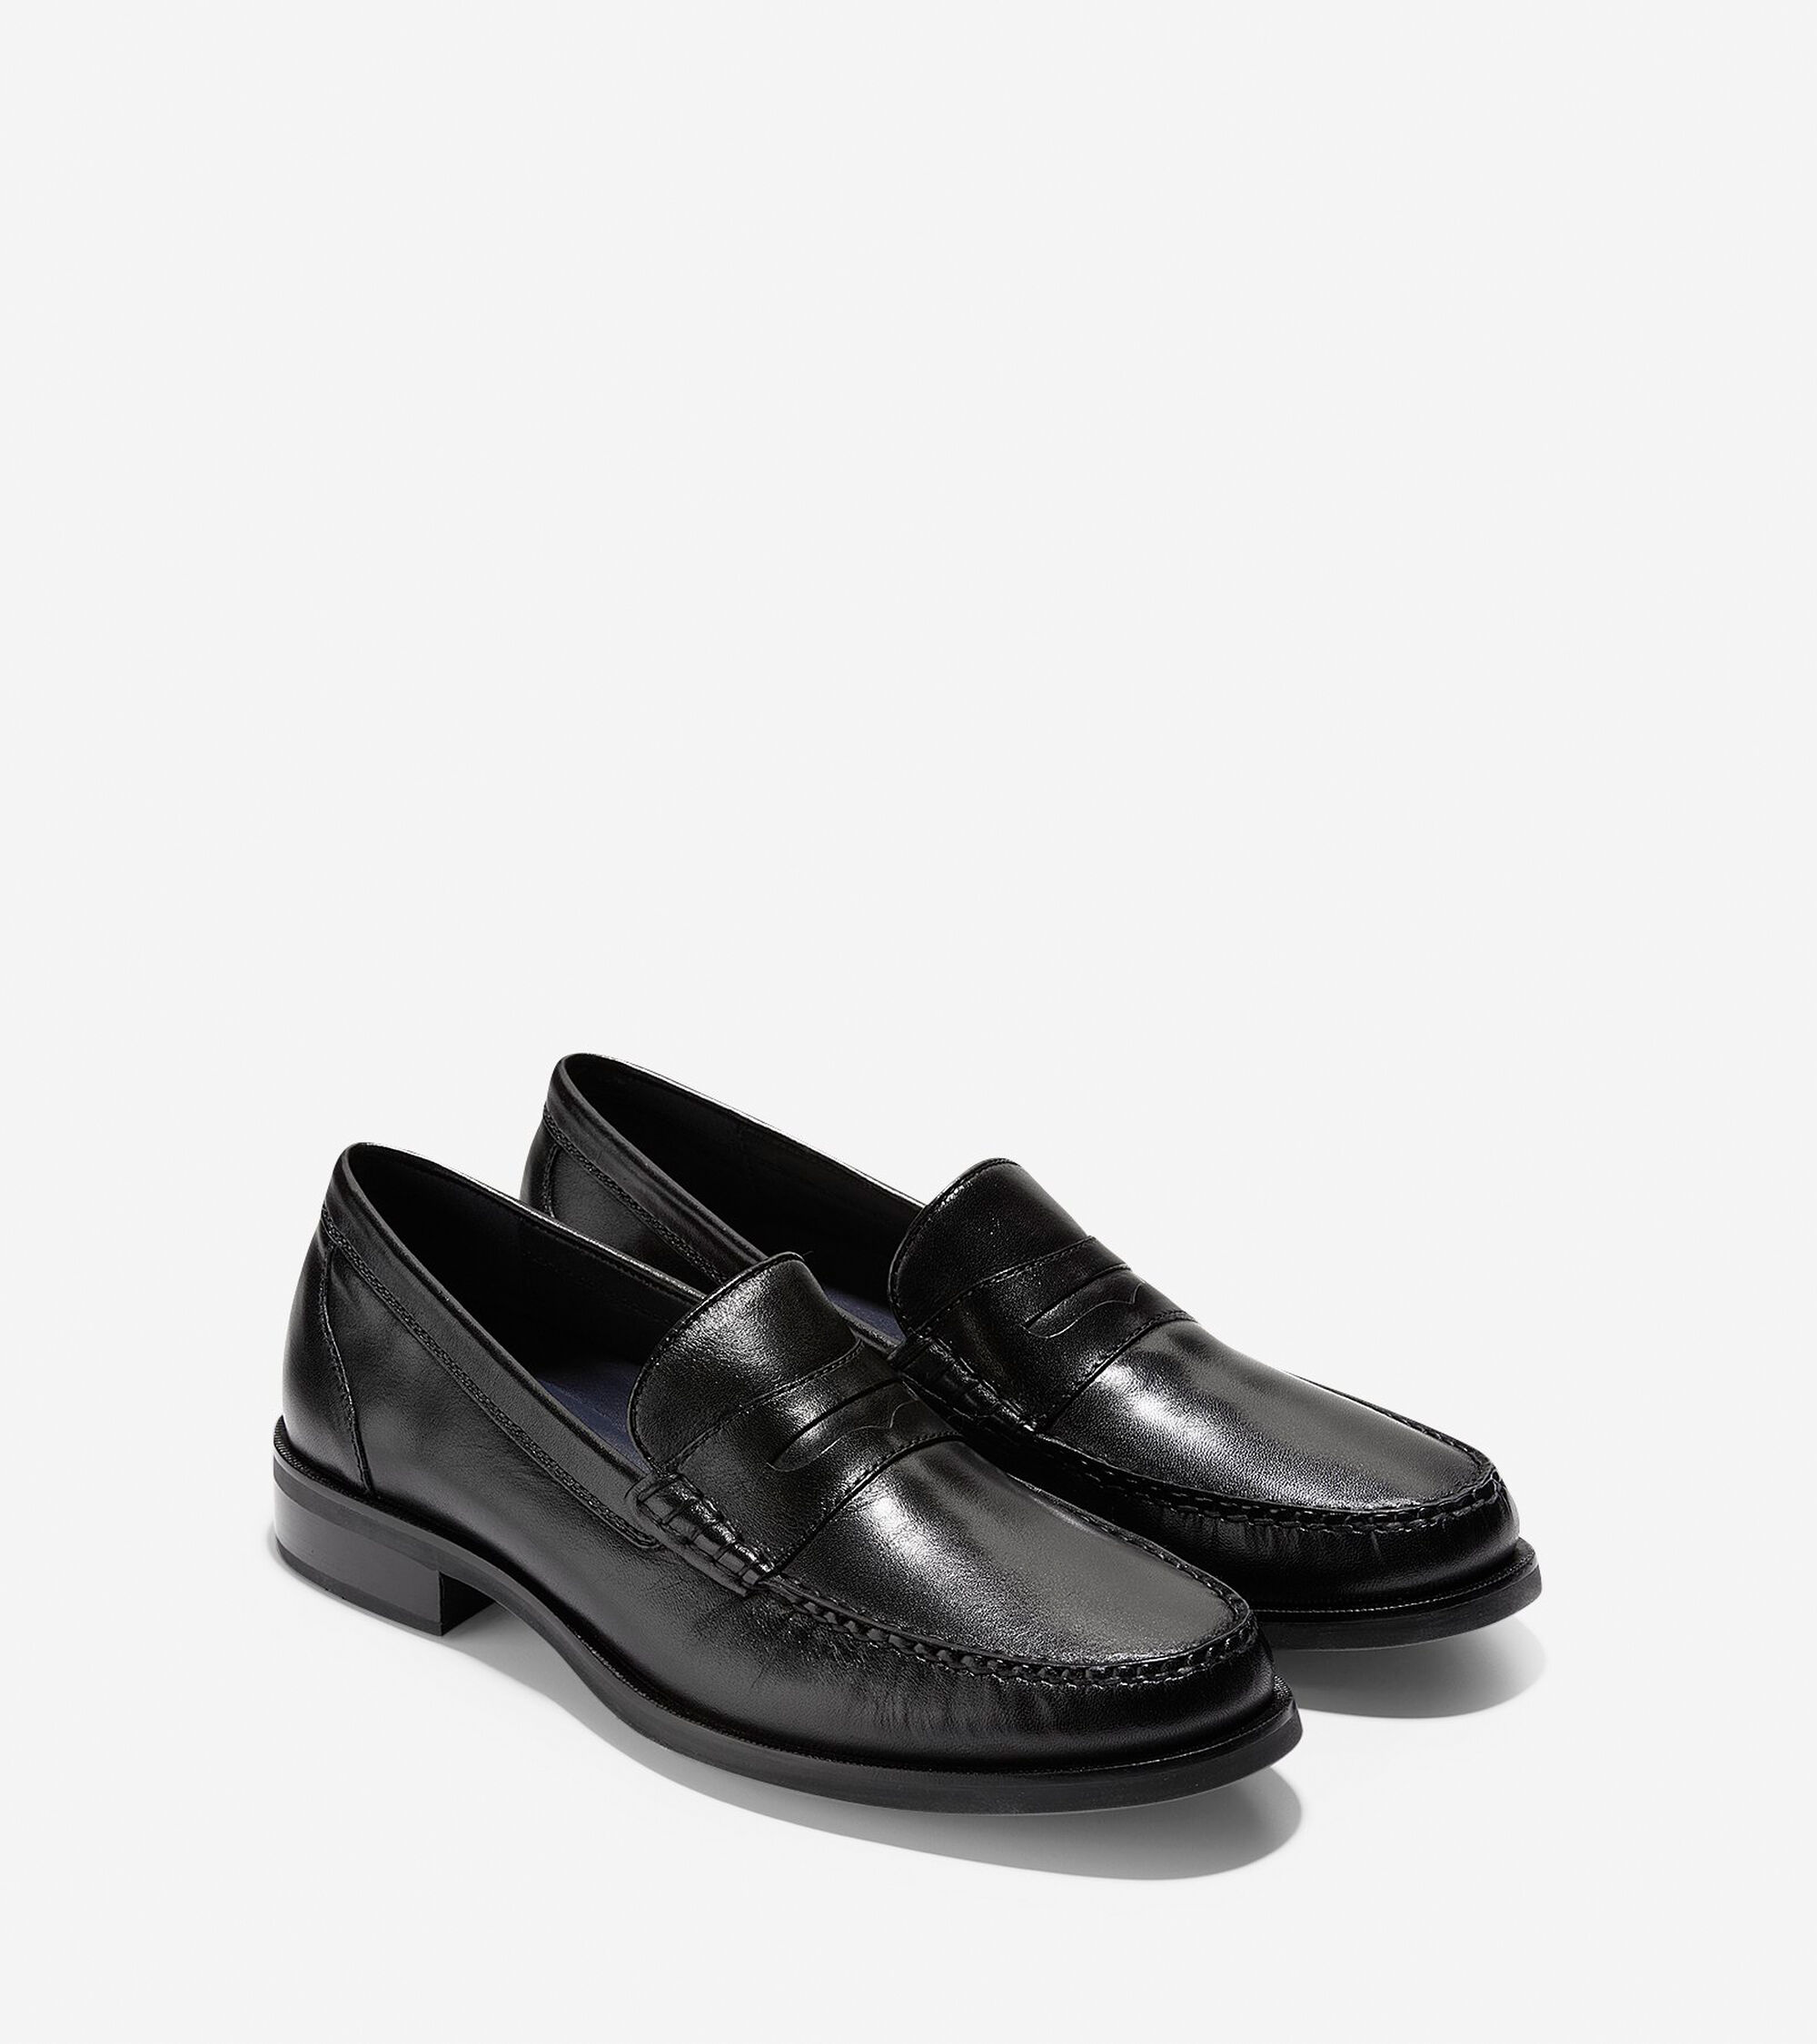 71f5b104e40 Men s Pinch Sanford Penny Loafers in Black